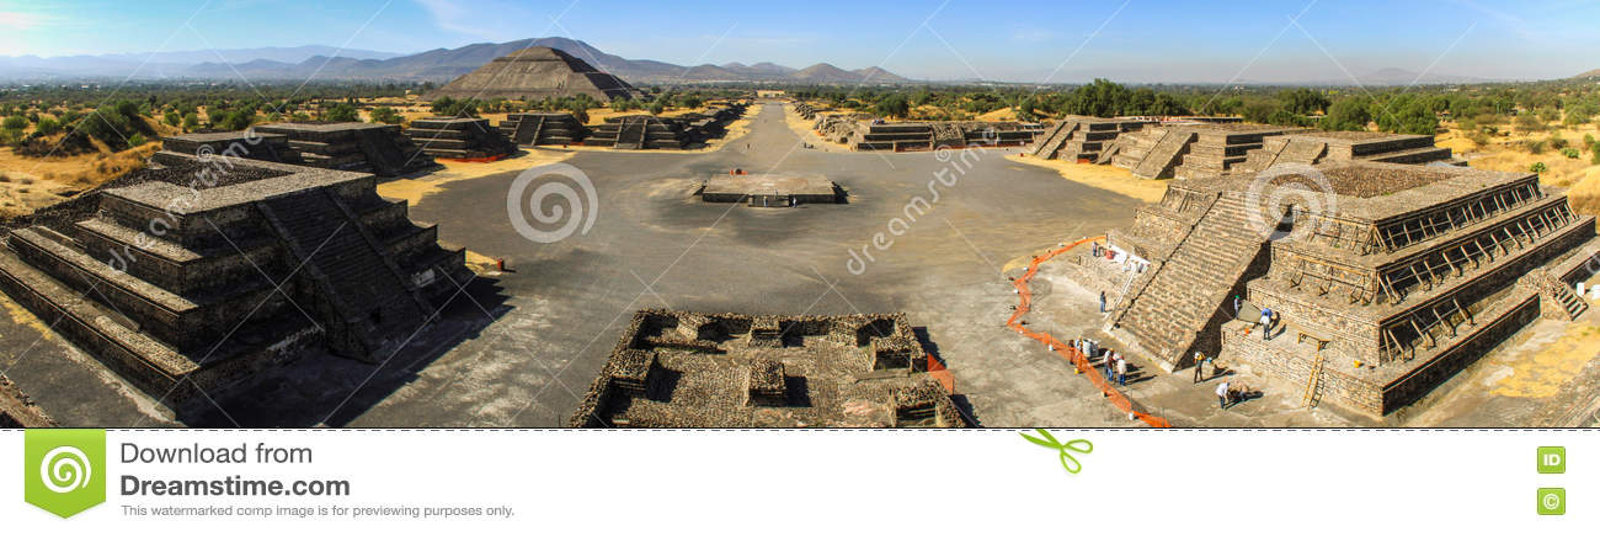 Vue panoramique du site de Teotihuacan de la pyramide de lune, Teotihuacan, Mexique